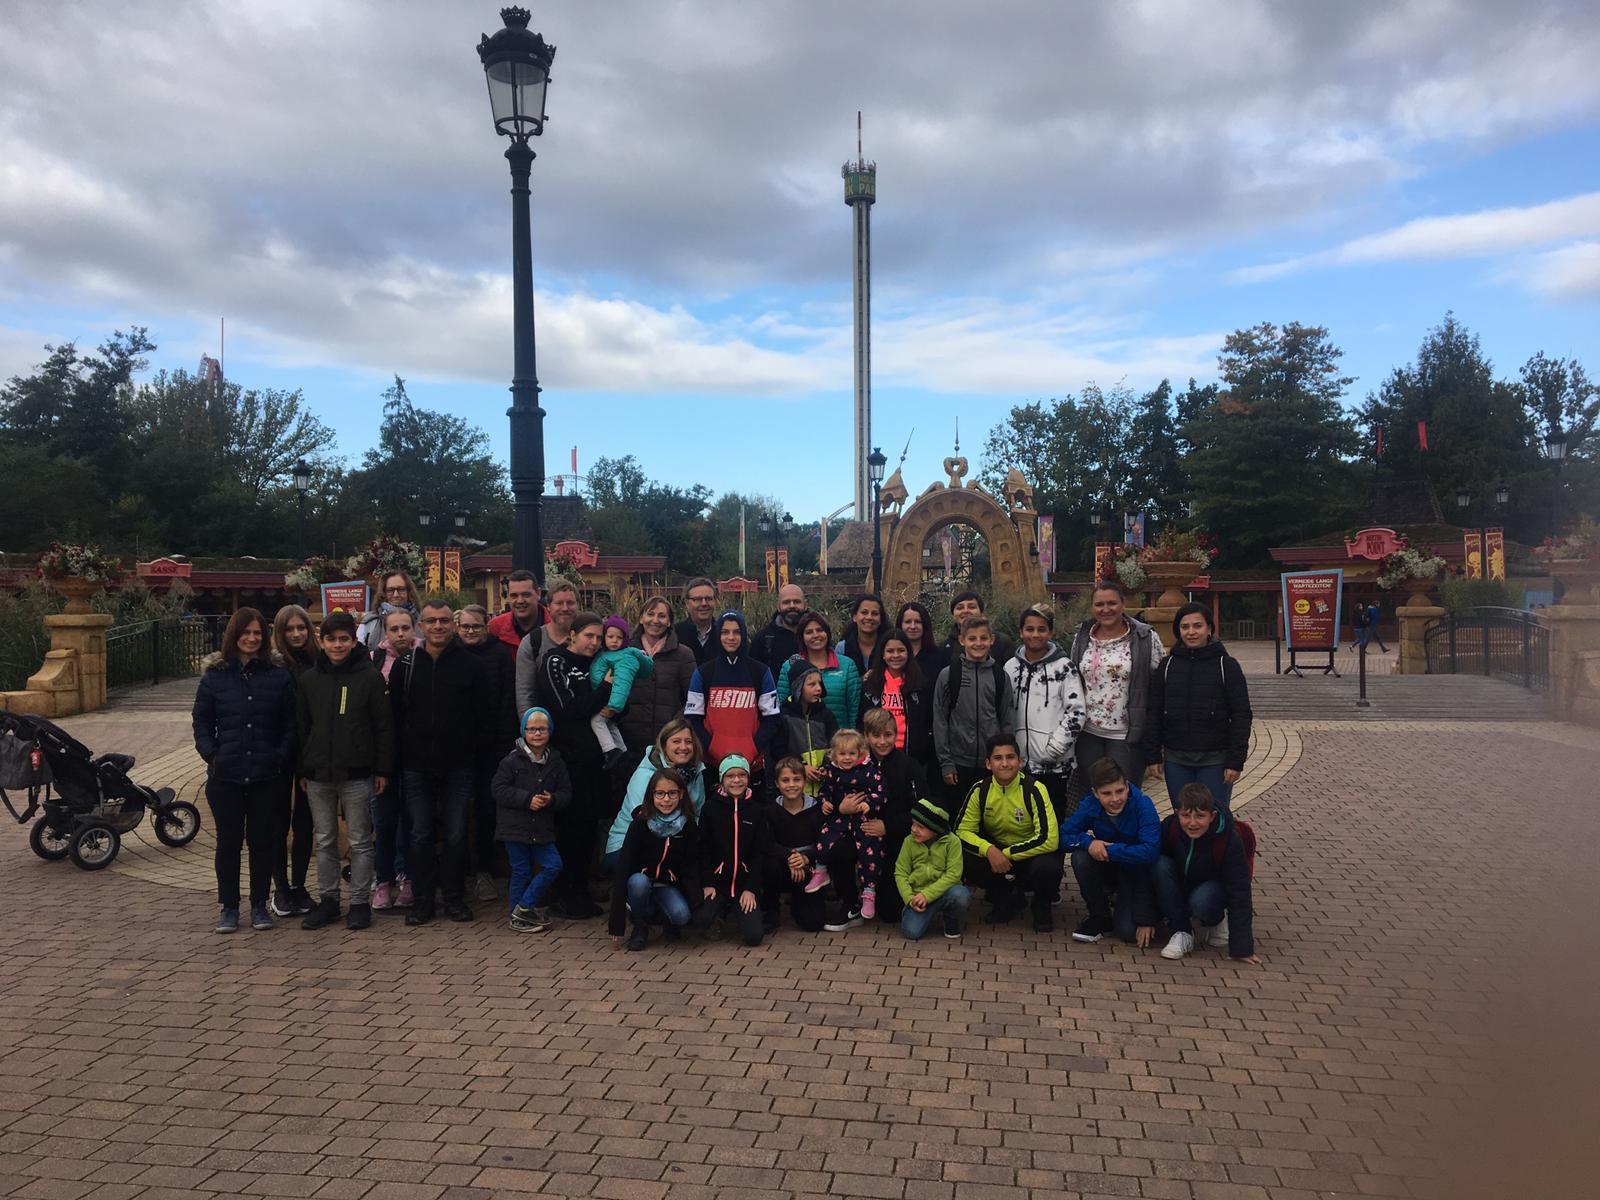 Ausflug zum Holiday Park nach Haßloch